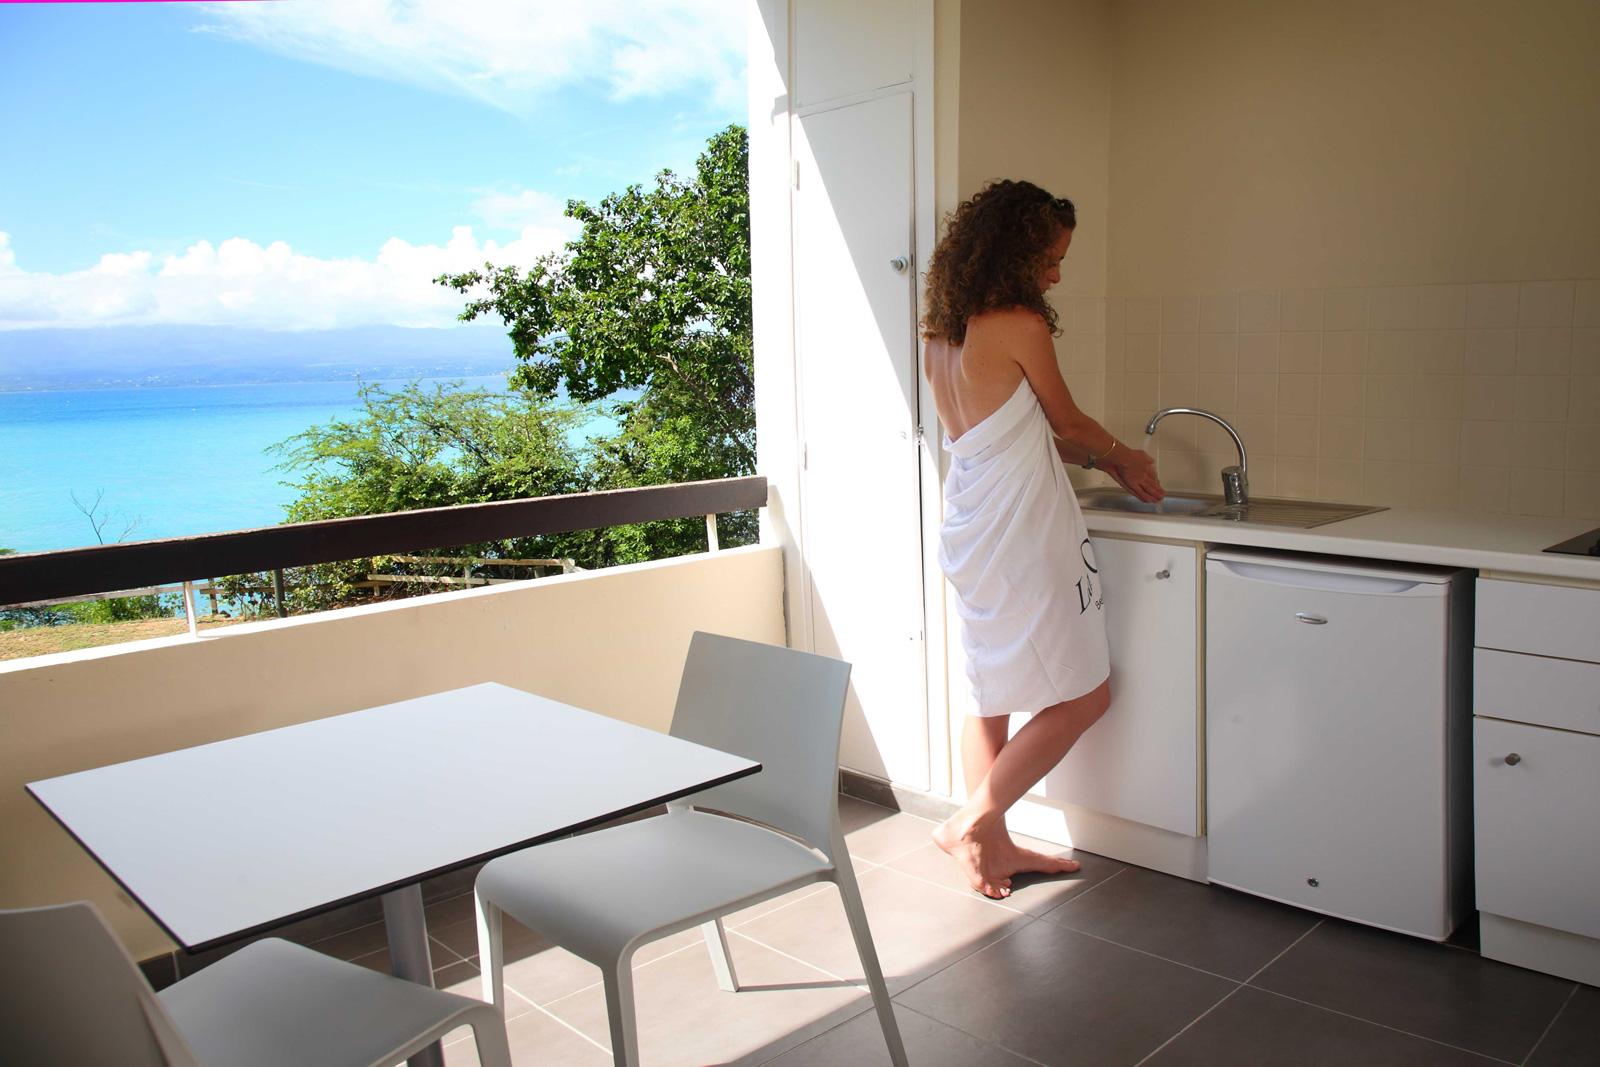 http://www.deshotelsetdesiles.com/hotel-vol-guadeloupe/photos/Chambre-Mahogany.28.jpg